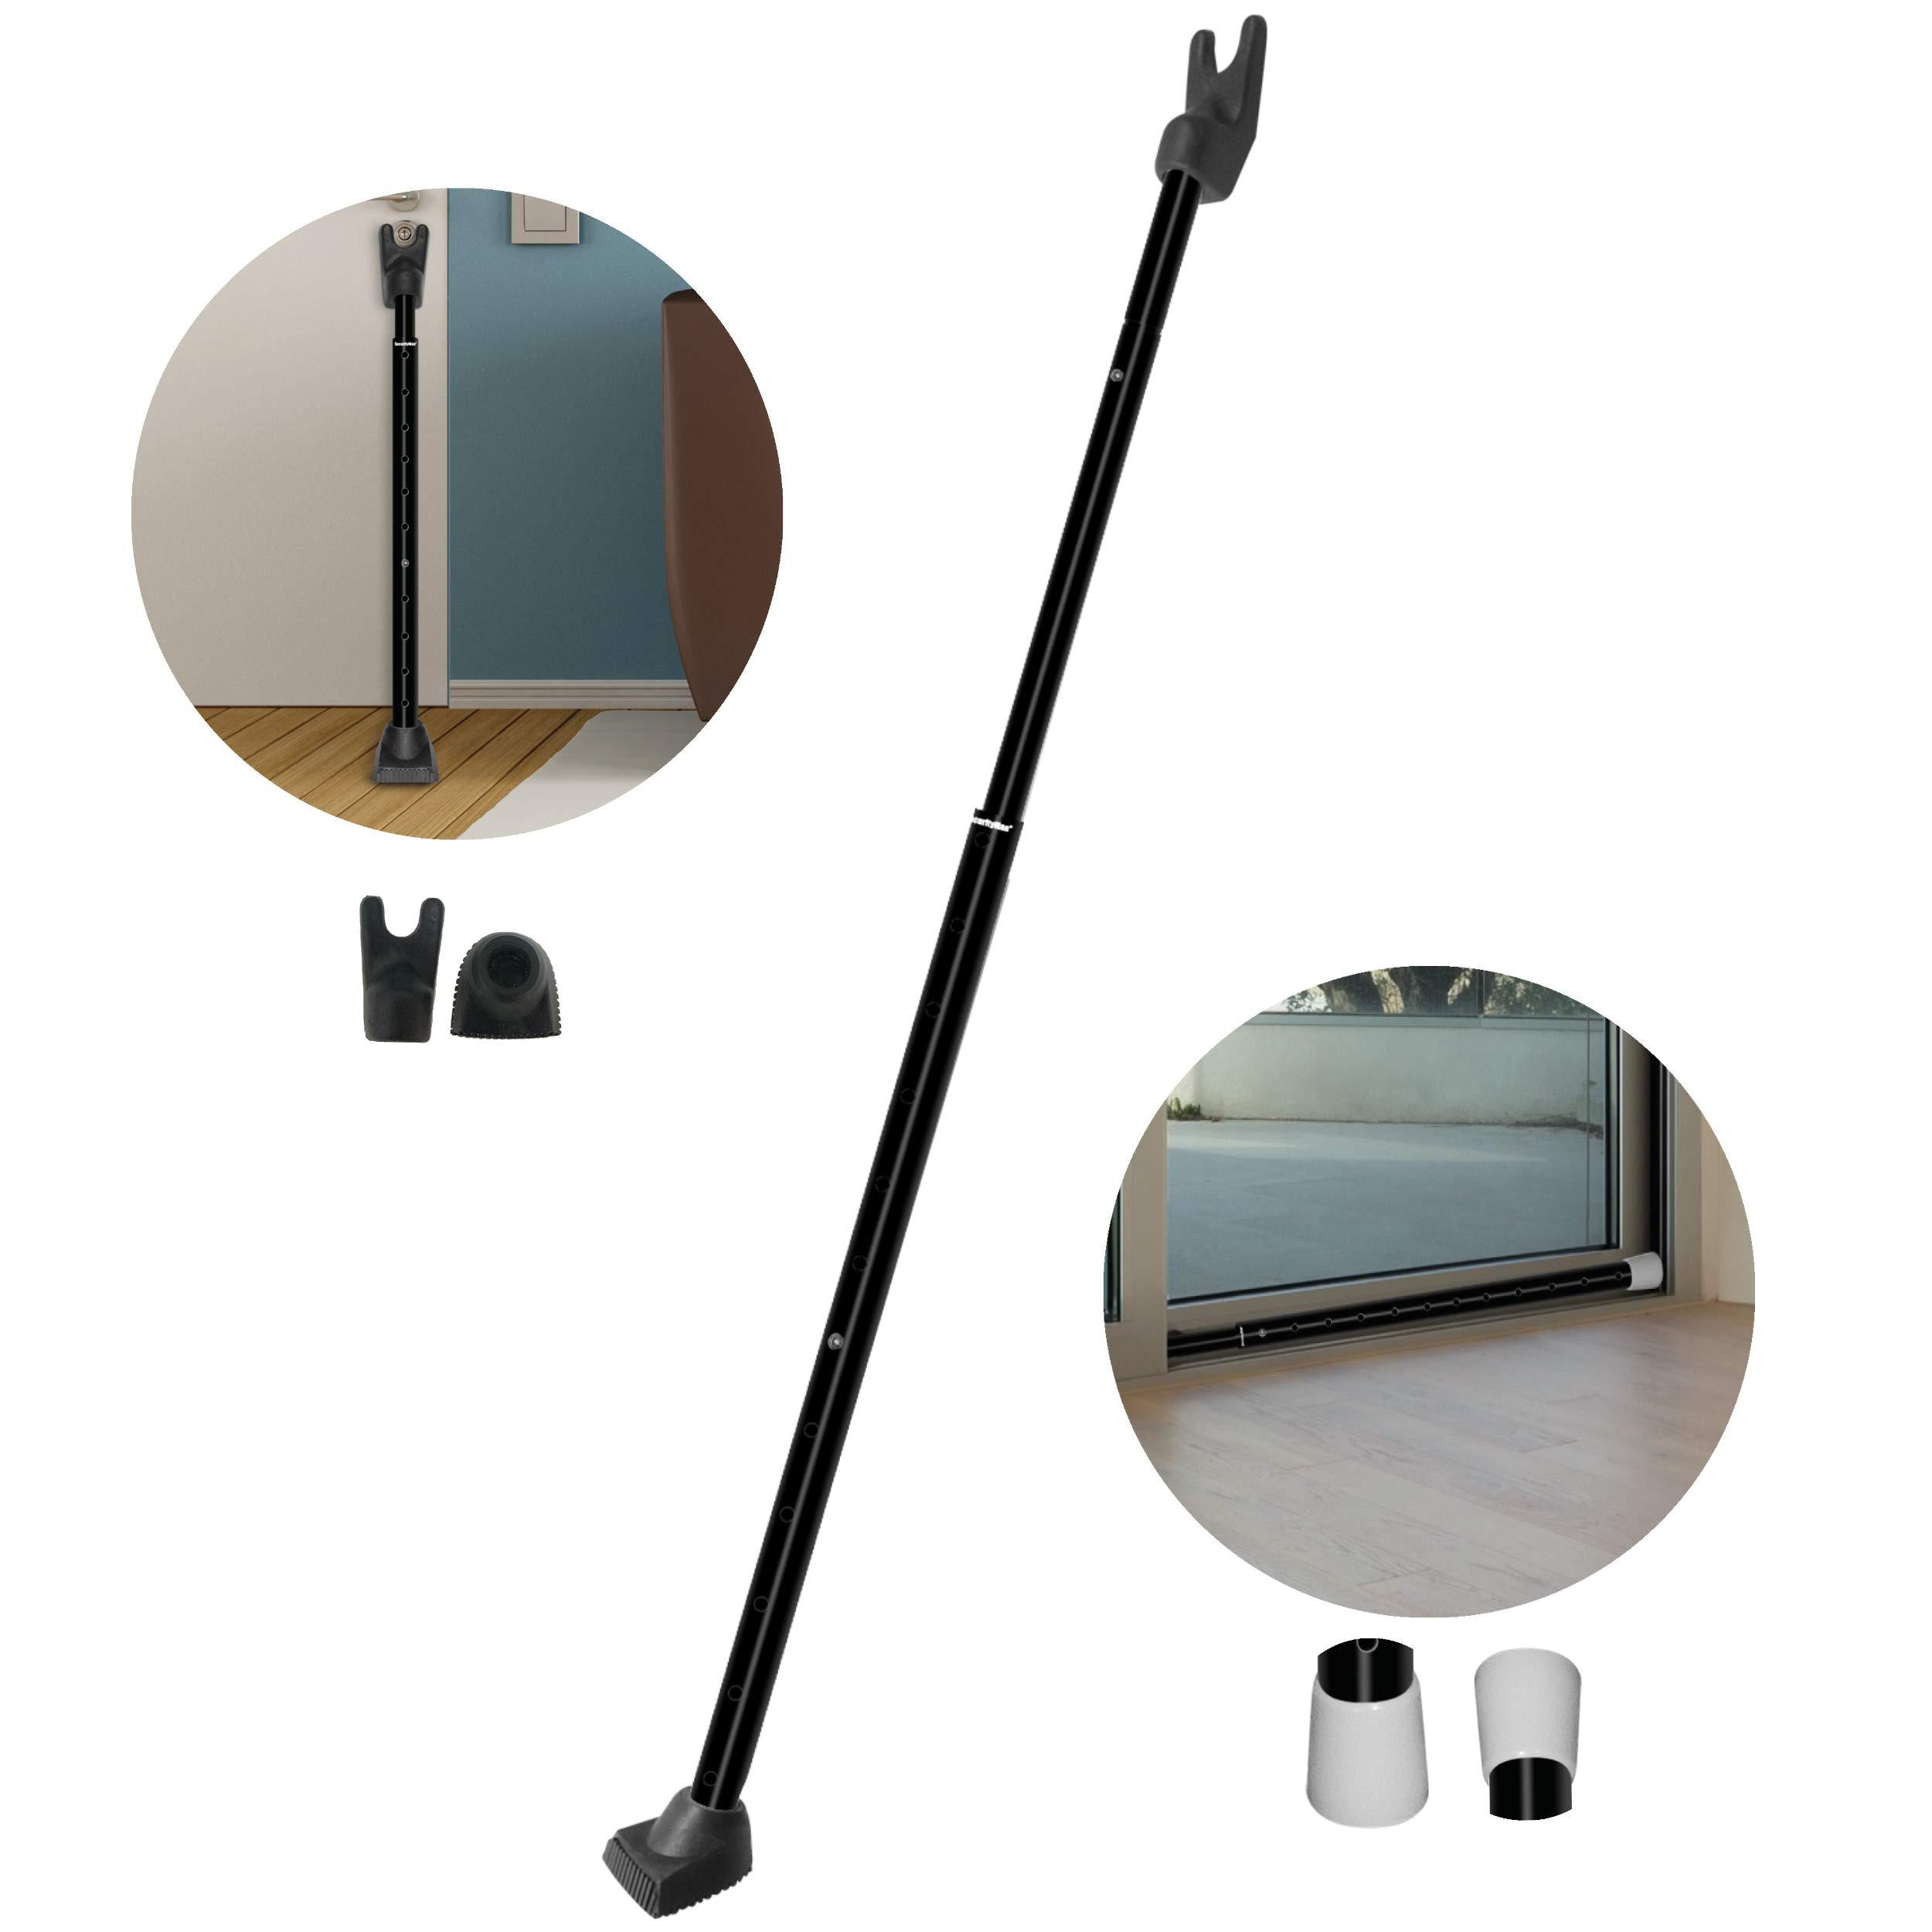 Details About Adjustable Sliding Door Security Bar Knob Jammer Lock Handle  Blocker Home Travel